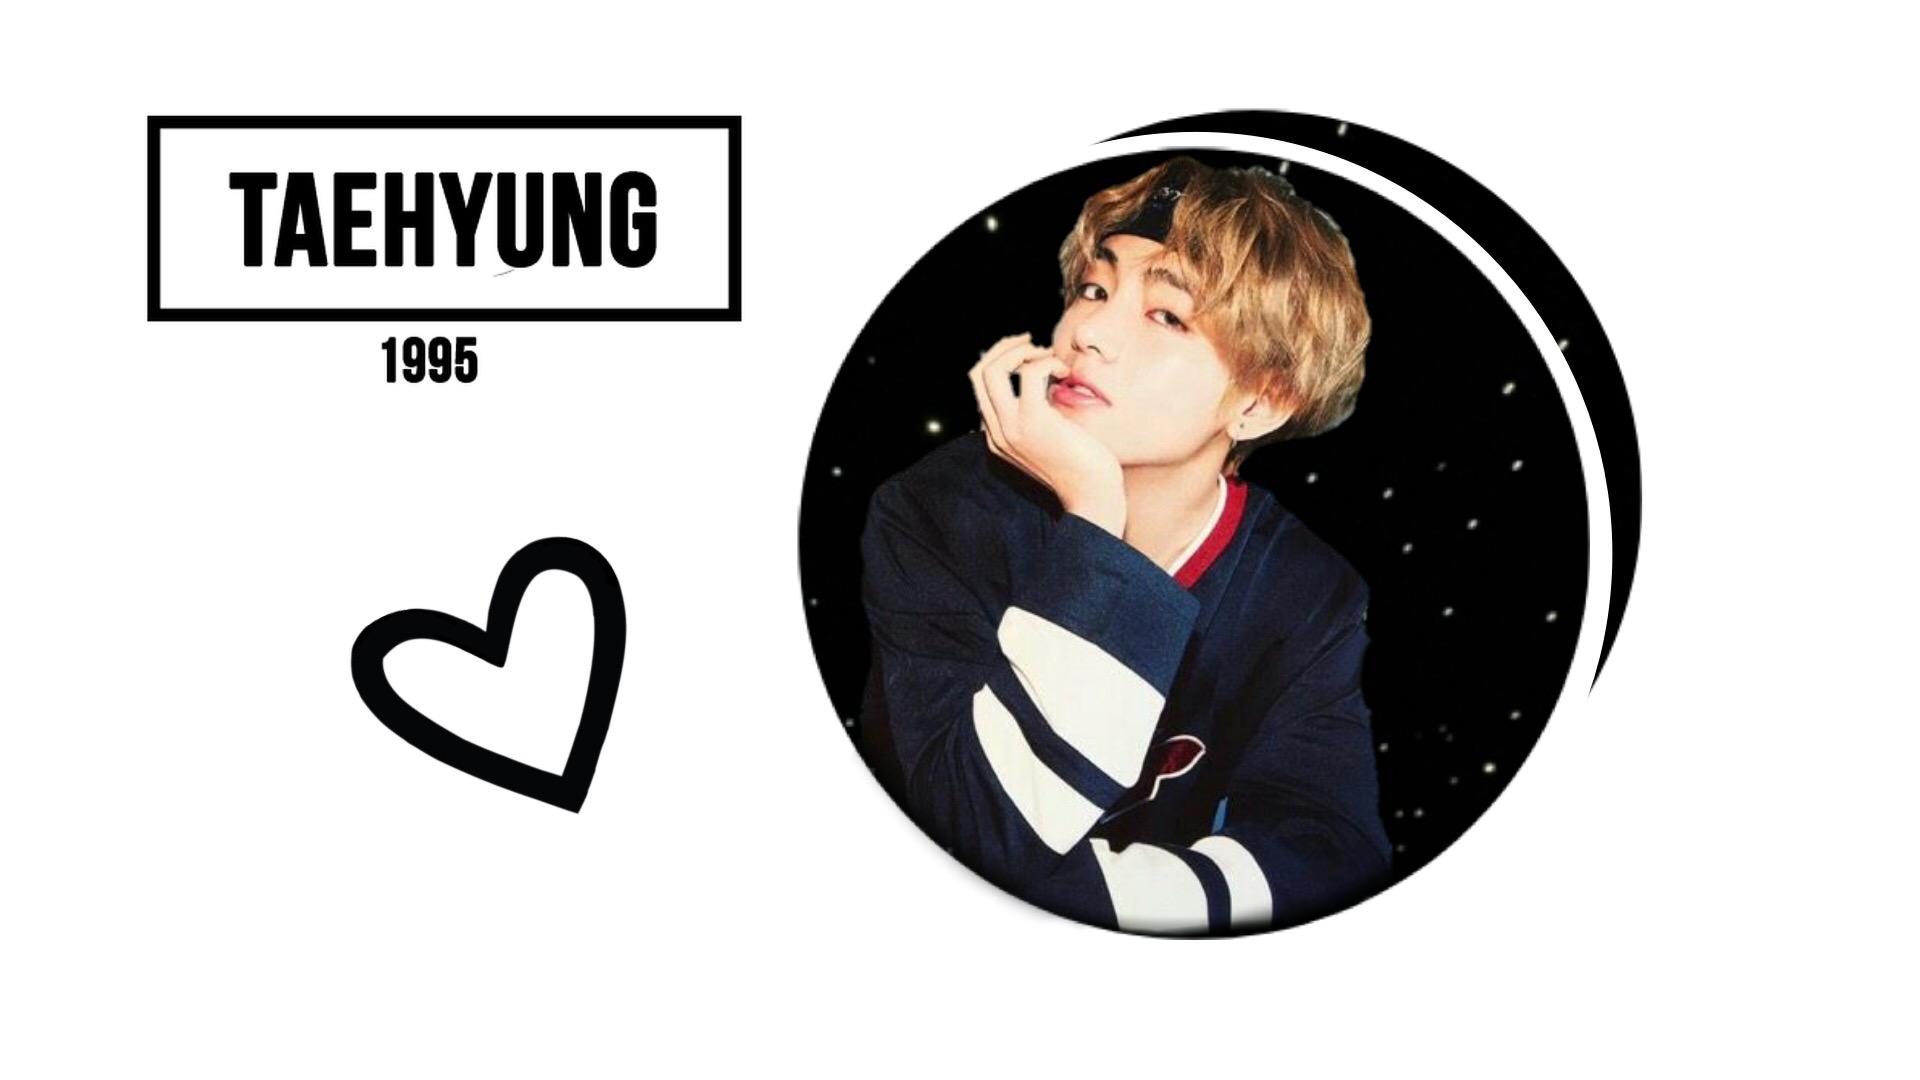 Freetoedit Taehyung Bts V Kpop Desktopwallpaper Bts Kim Taehyung Logo 1920x1080 Wallpaper Teahub Io